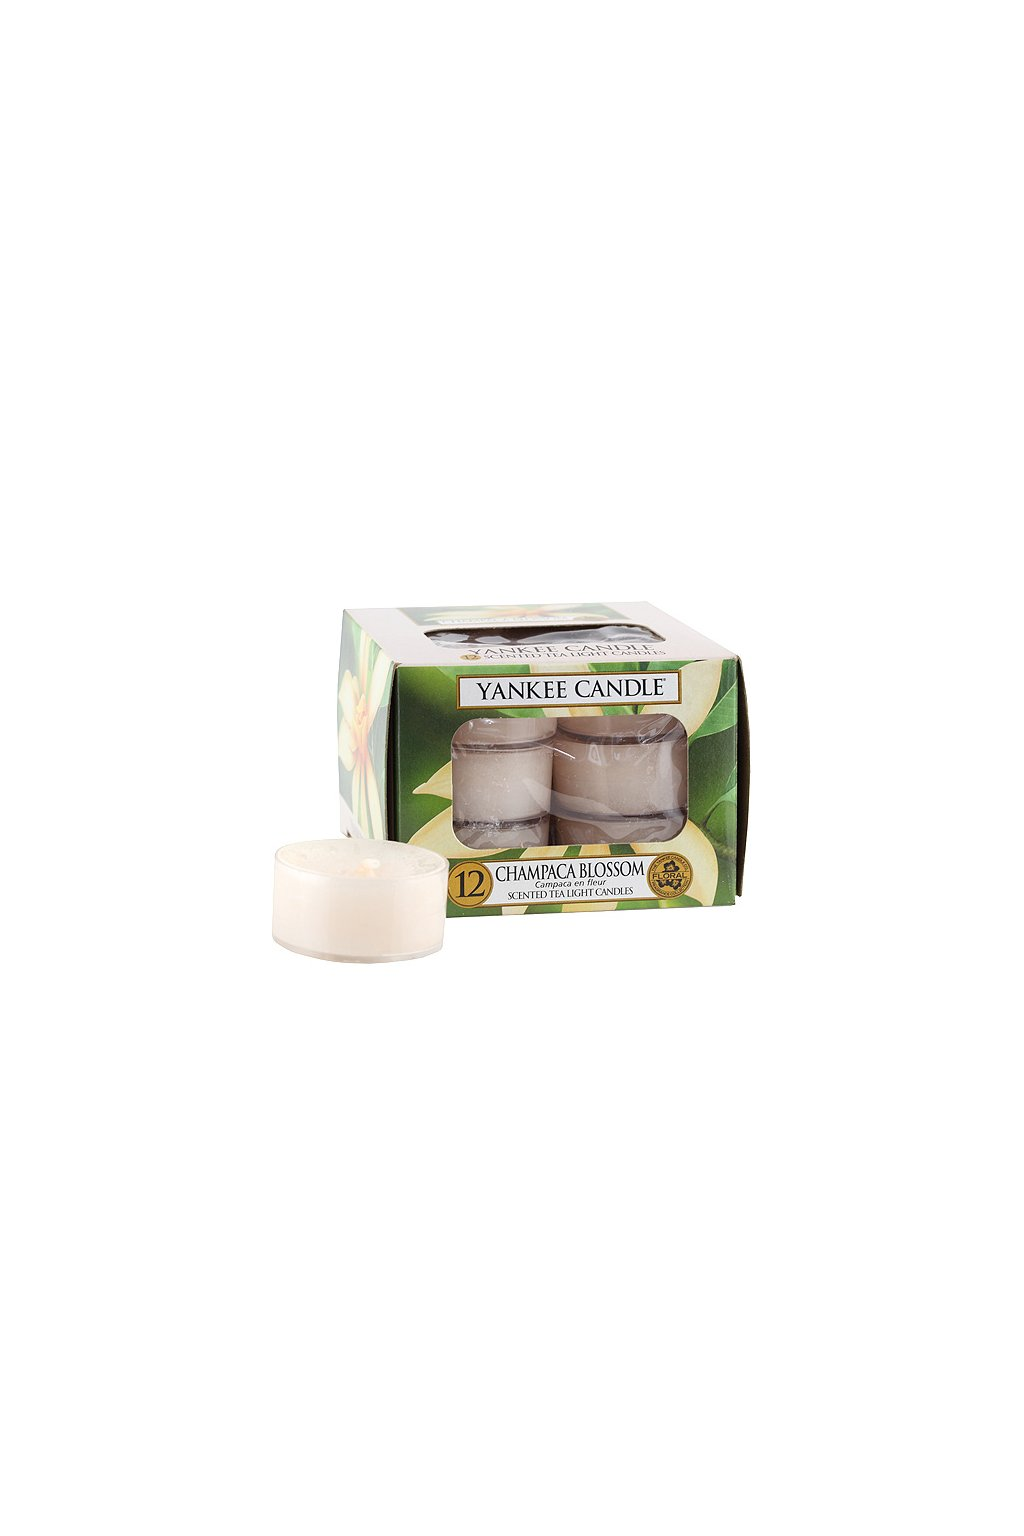 Yankee Candle Champaca Blossom Tea Light